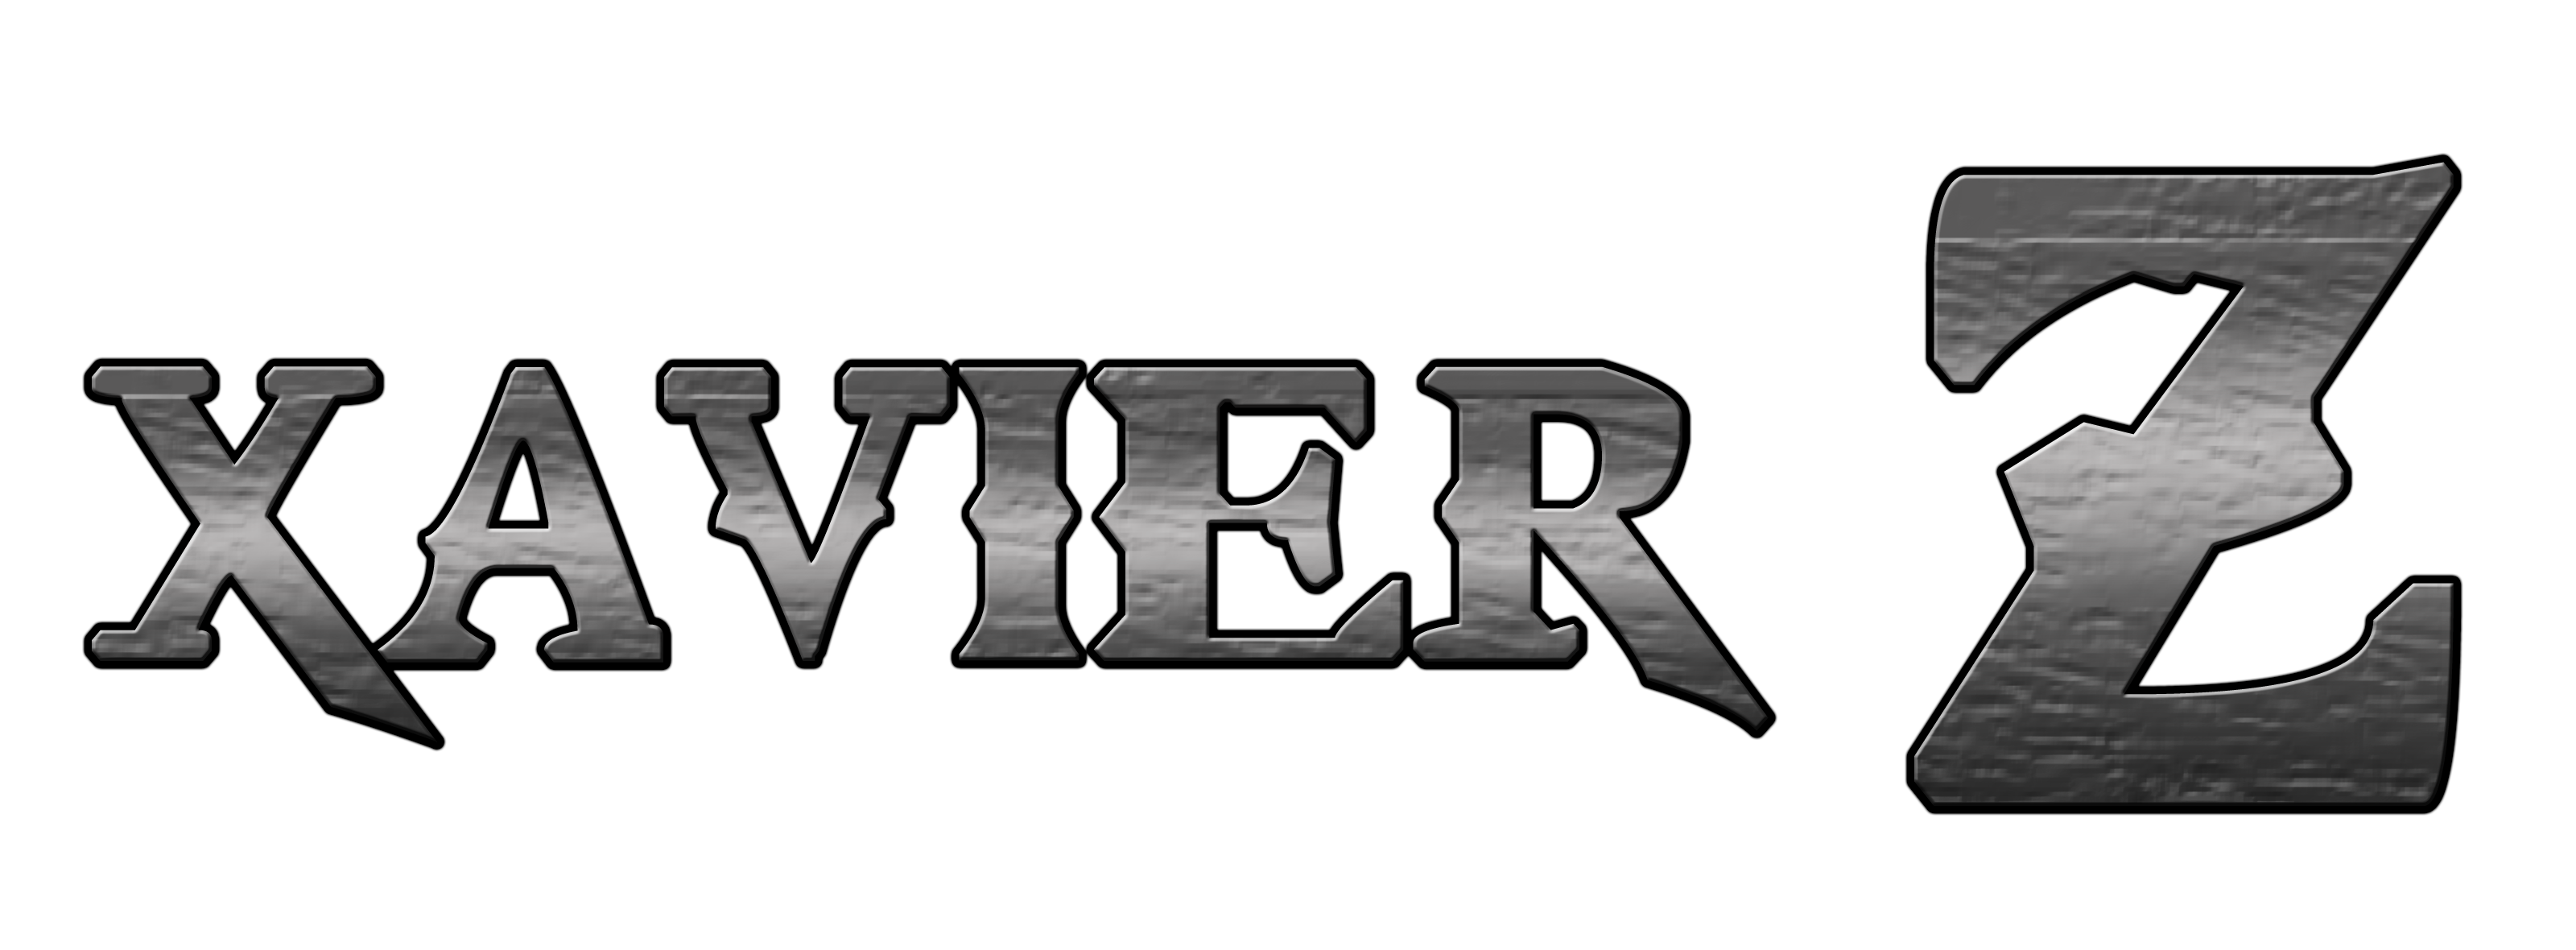 Xavier z logo by kingasylus91 on deviantart for Xavie z